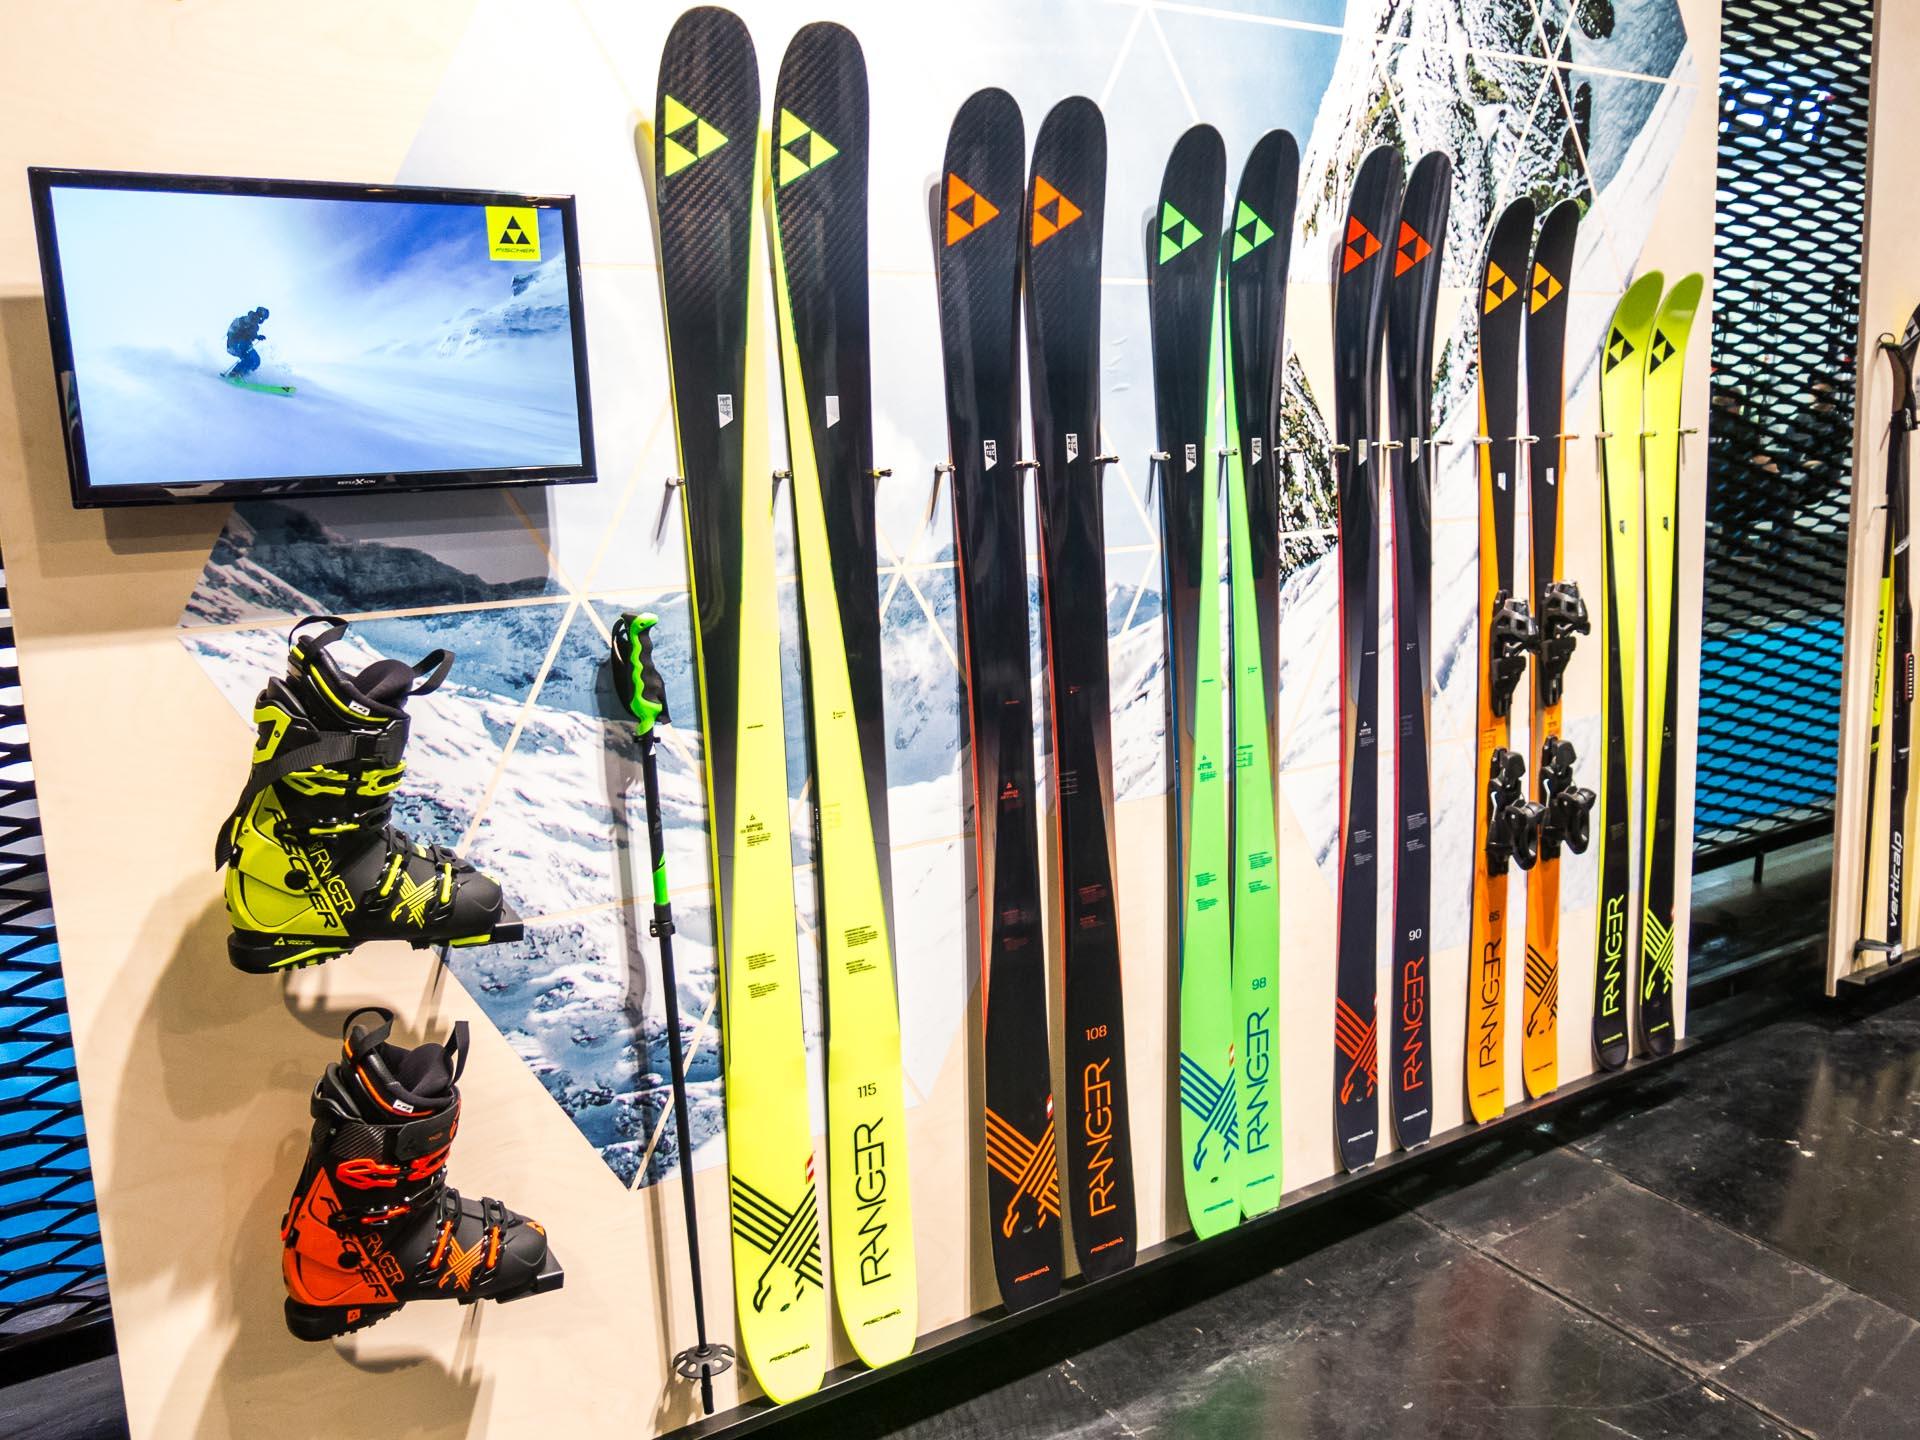 ispo 2017 ski highlights teil 2 mit atomic k2 salomon co seite 8 von 19 prime skiing. Black Bedroom Furniture Sets. Home Design Ideas